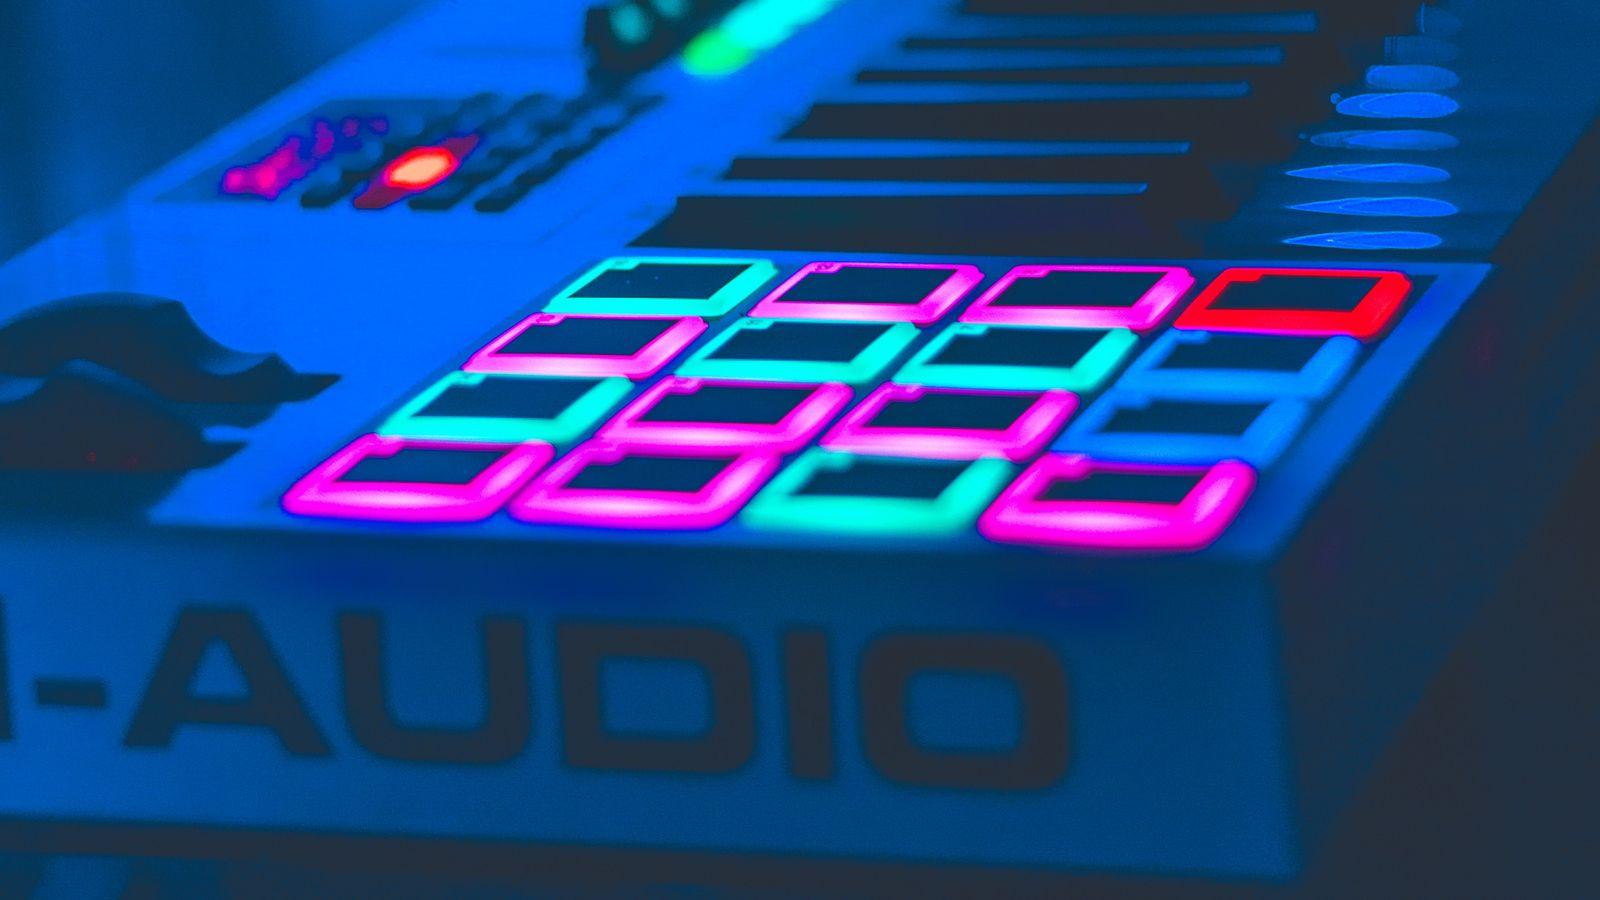 1600x900 Wallpaper neon, key, instrumental, audio